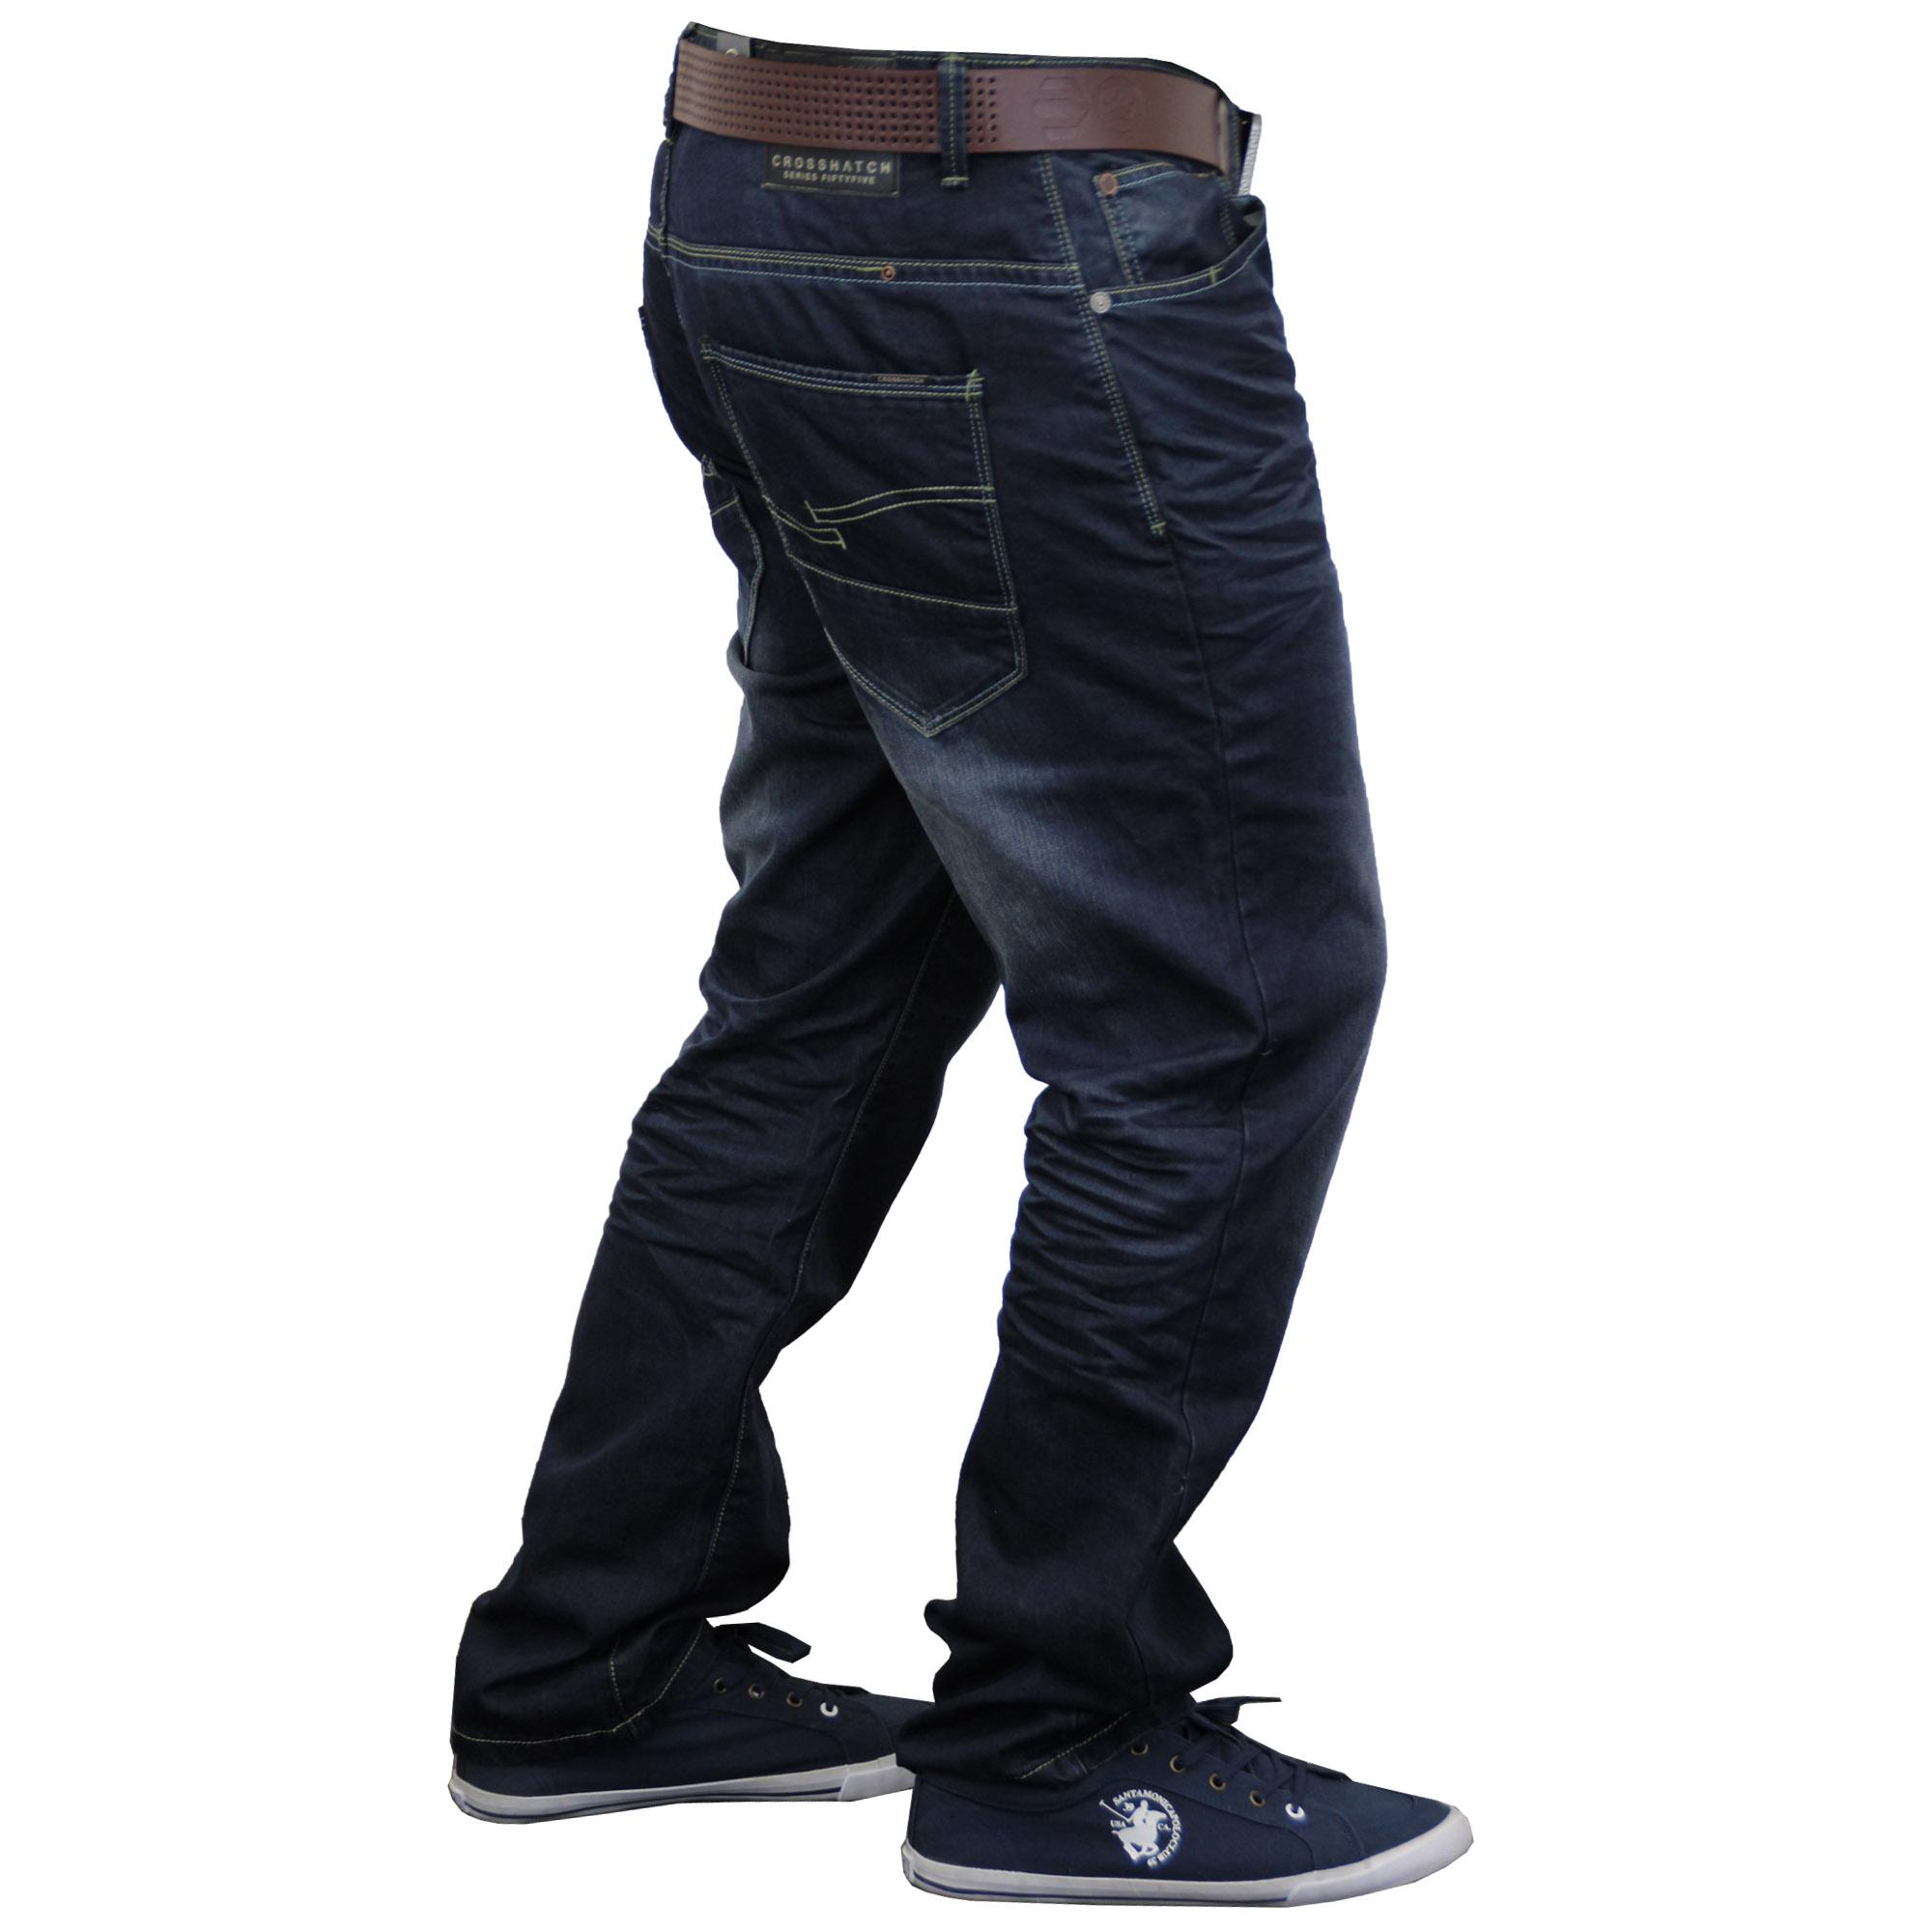 Mens-Denim-Jeans-Crosshatch-Bottoms-Trousers-FREE-BELT-Straight-Leg-Pants-Casual